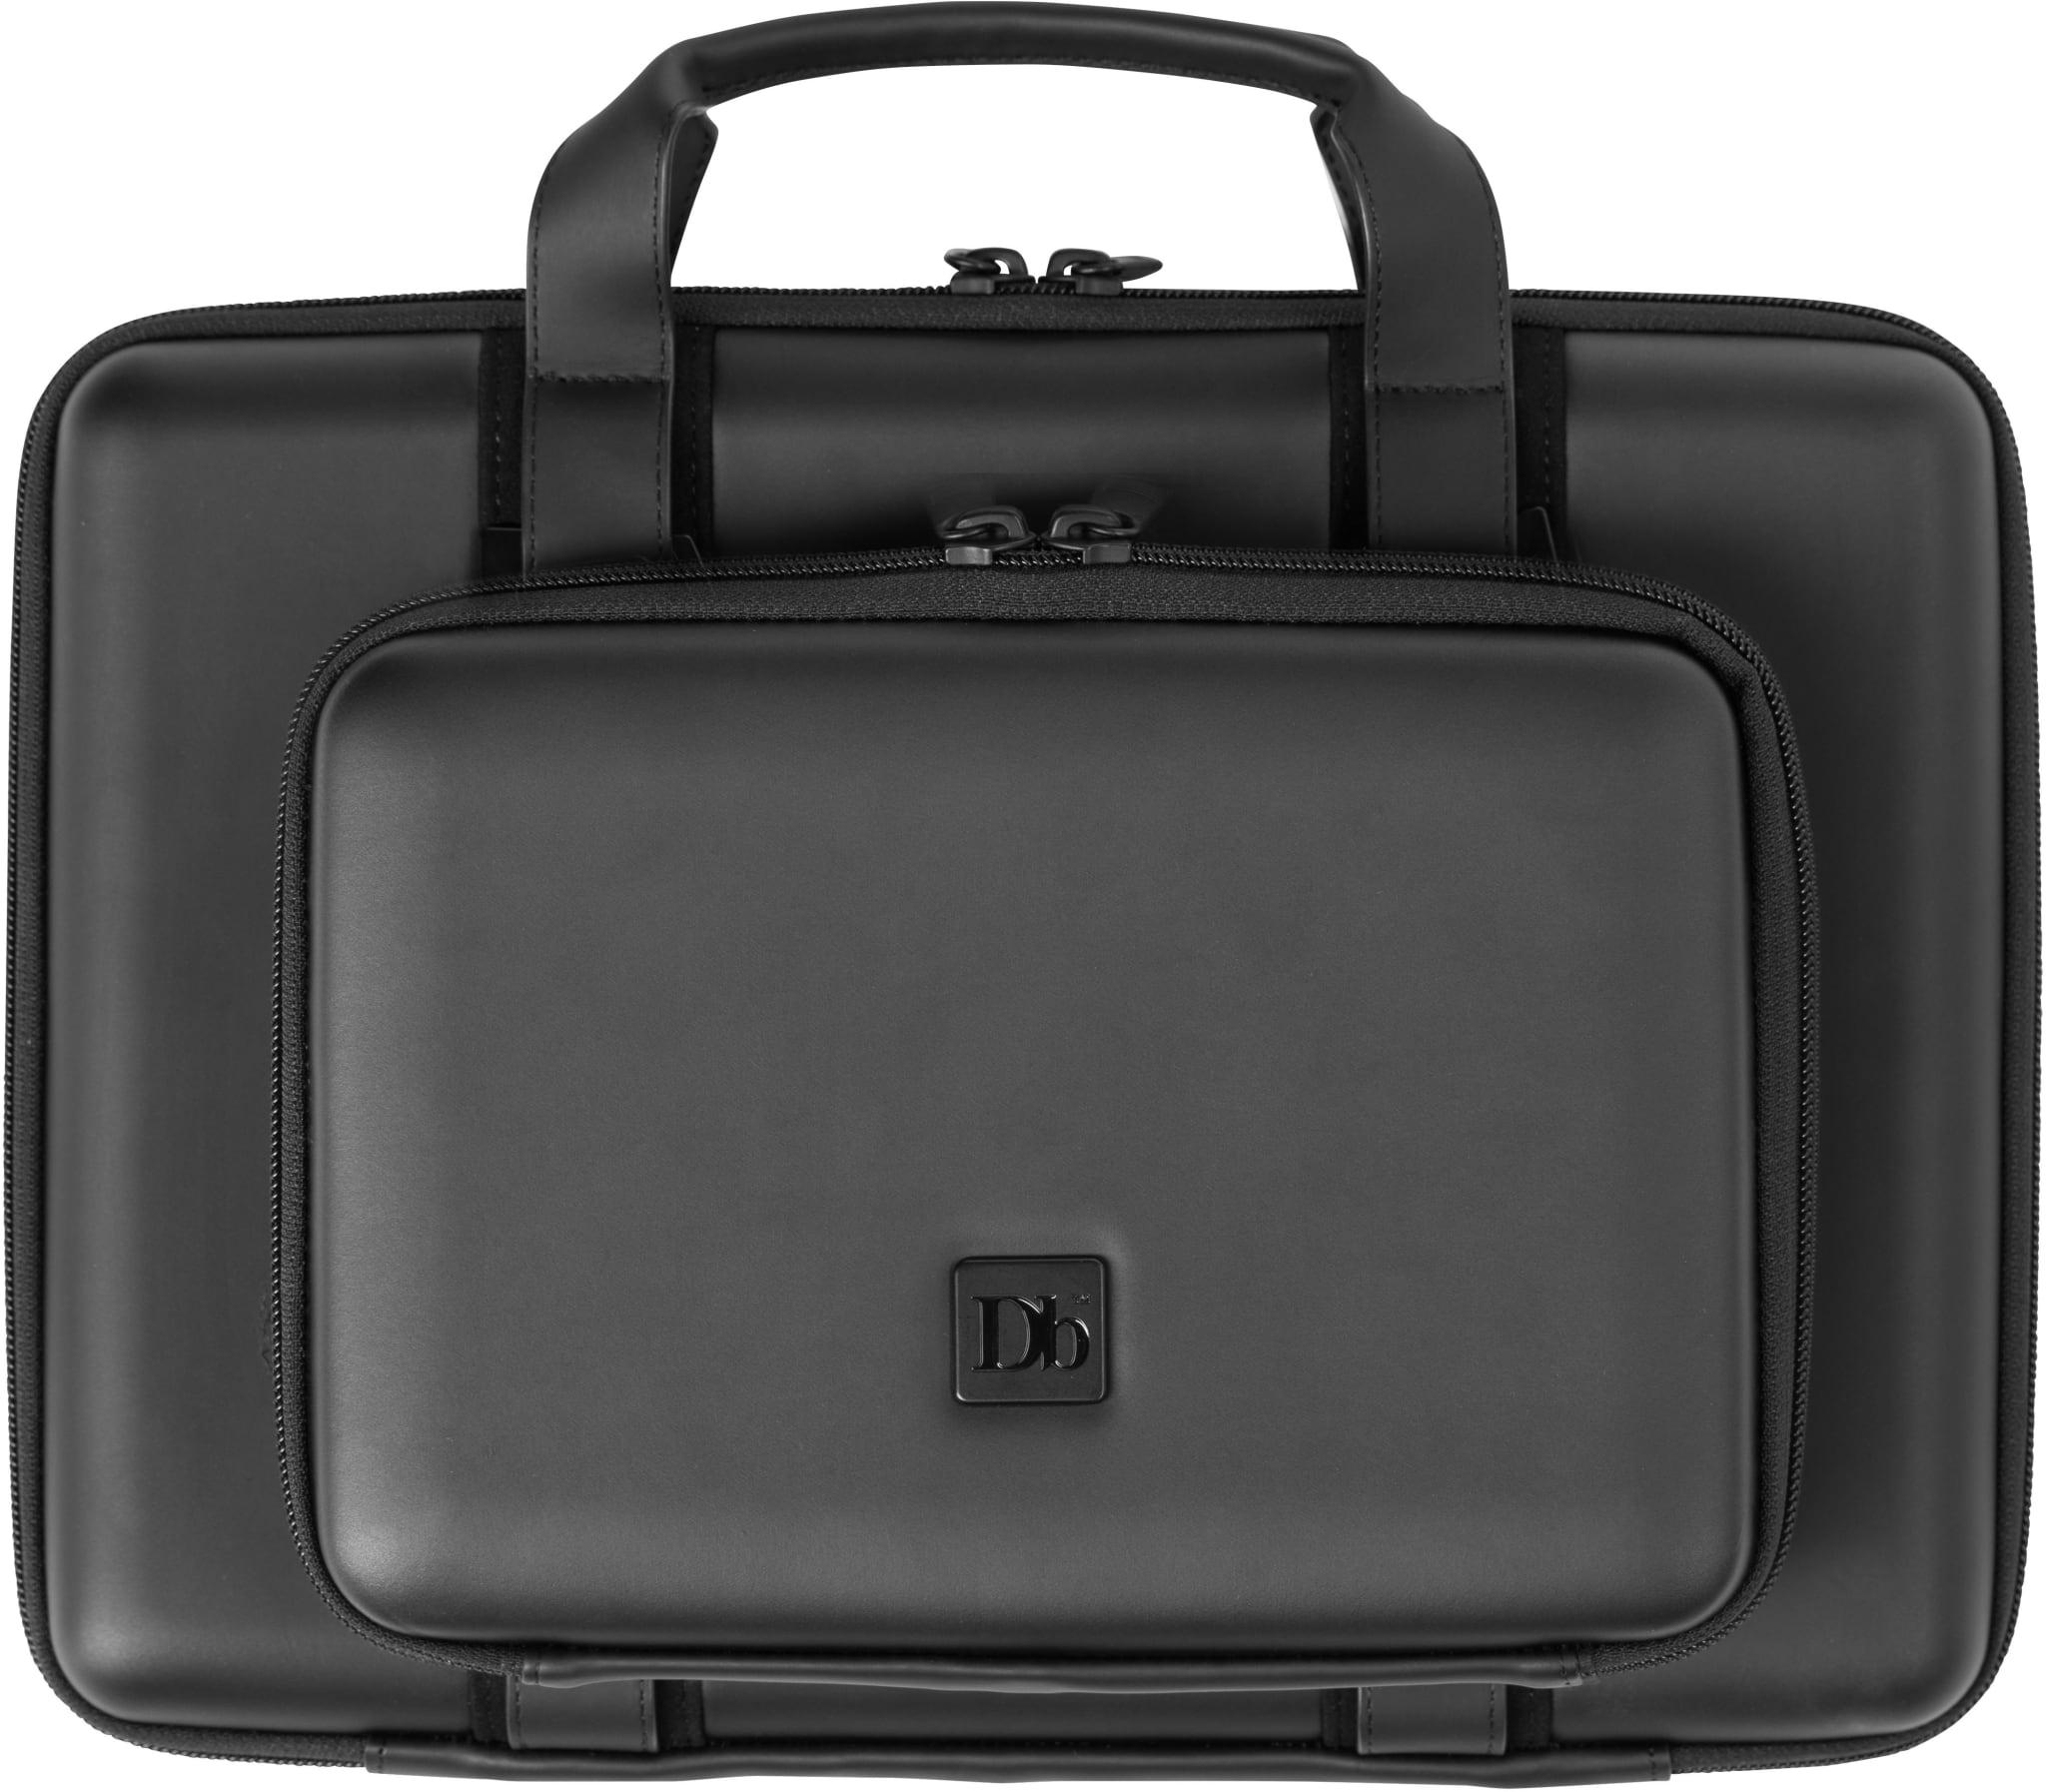 The Hacker Laptop Case 13